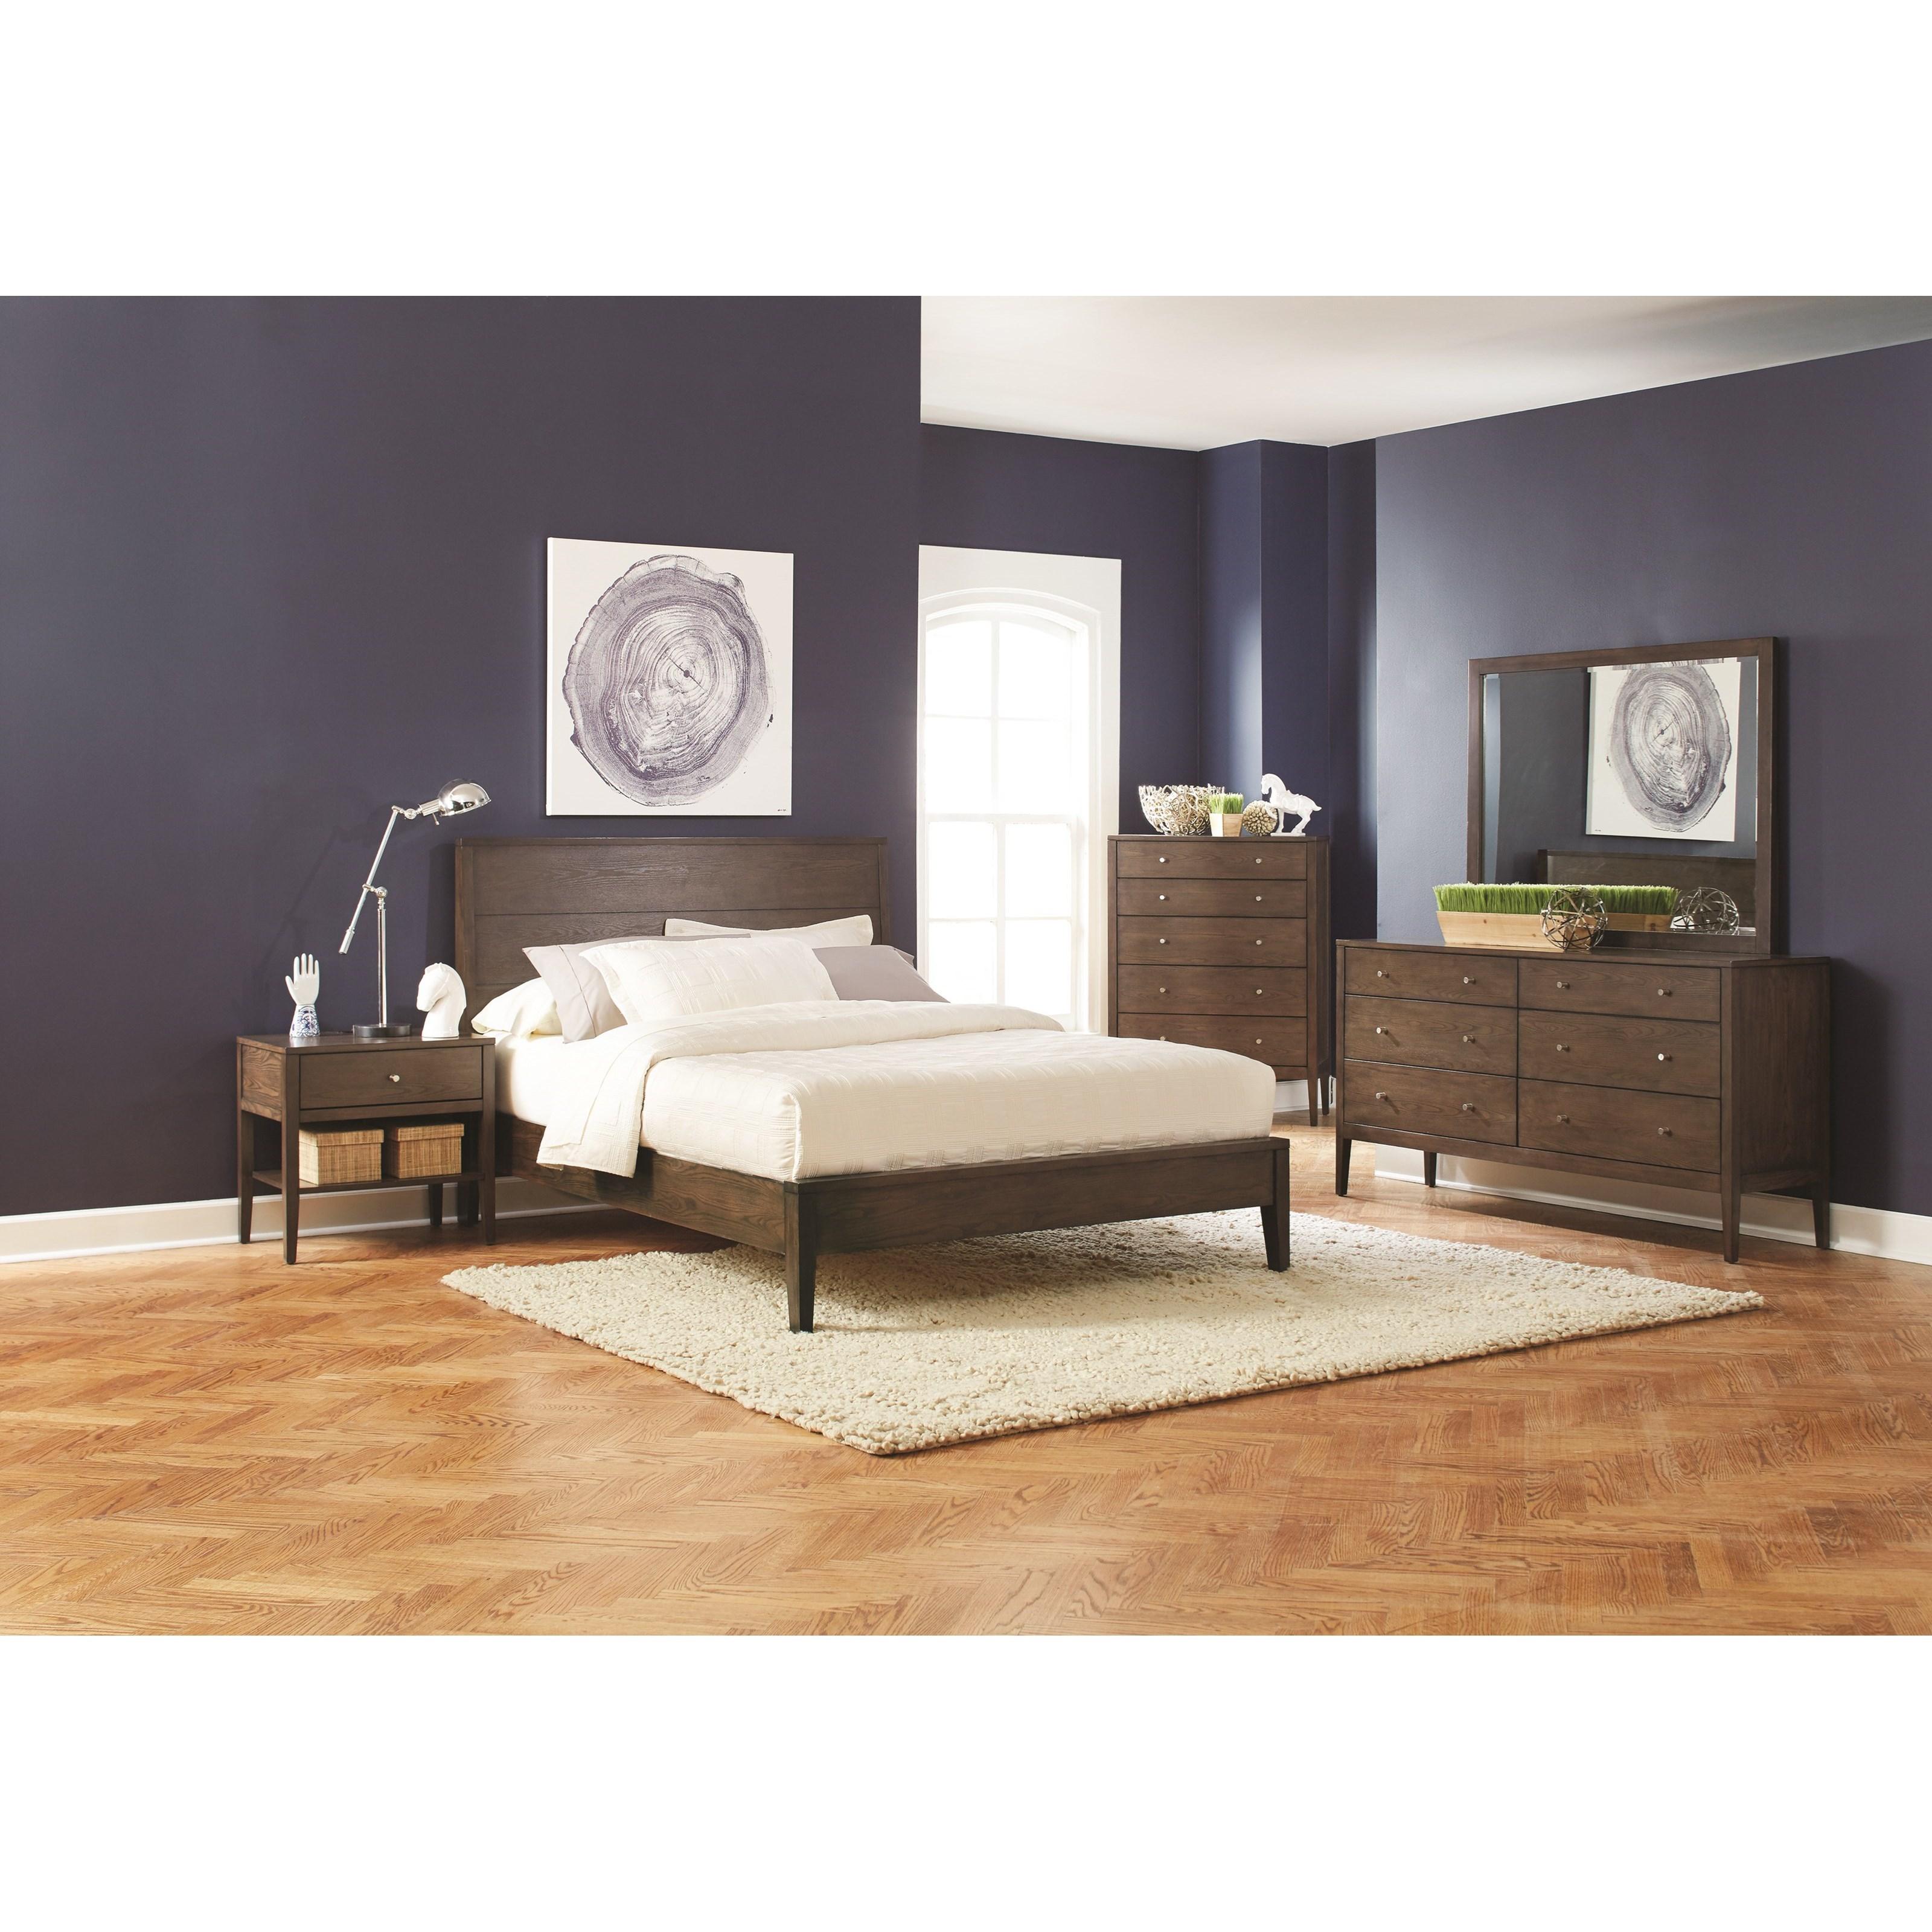 Coaster lompoc queen bedroom group beck 39 s furniture for Bedroom groups